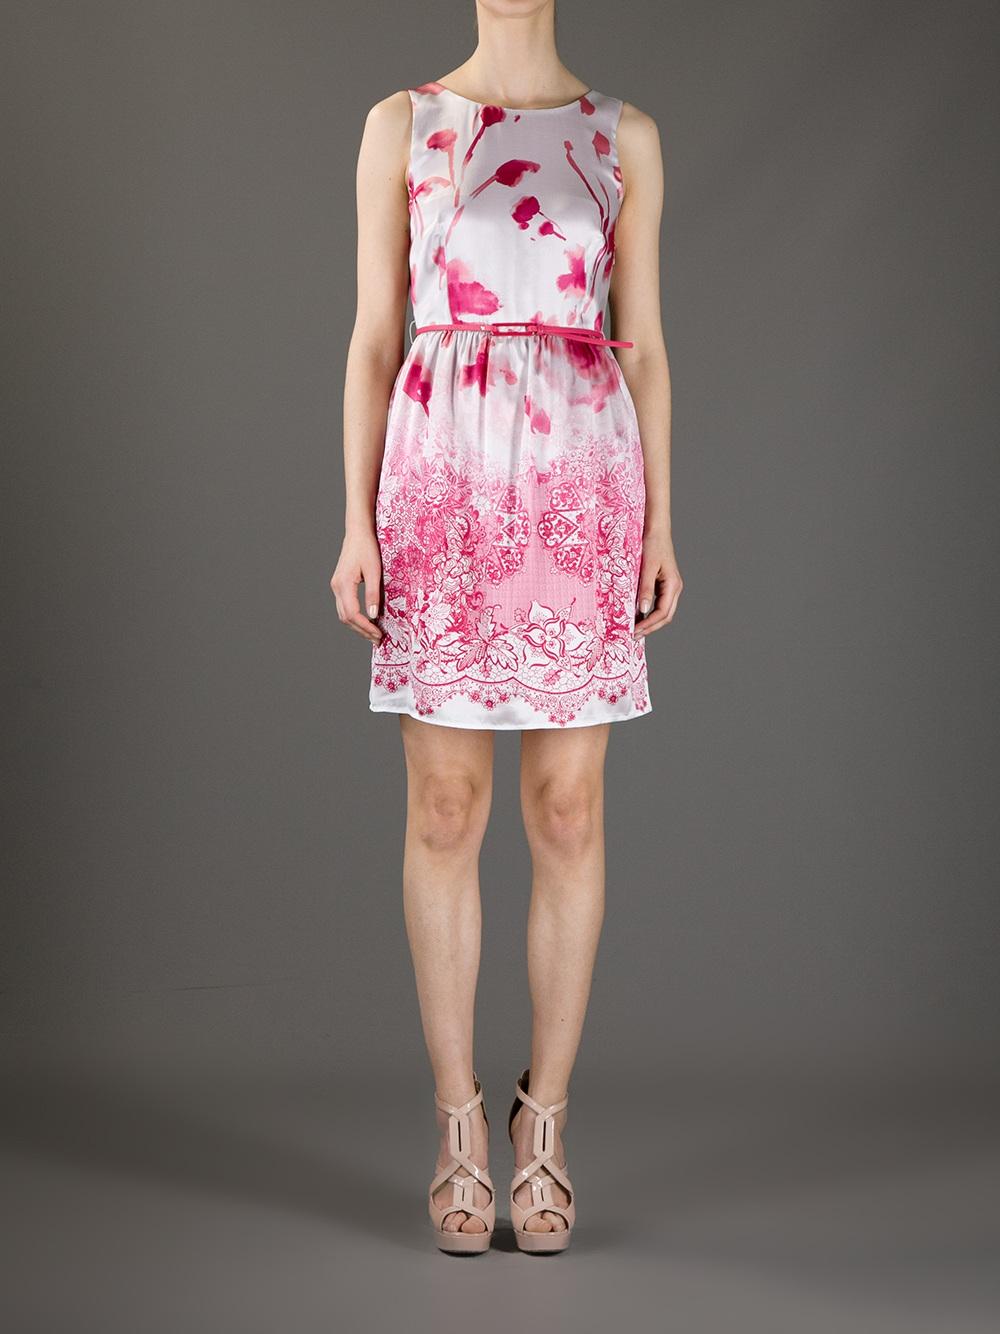 ee675ee2043 Liu Jo Mixed Floral Print Dress in Pink - Lyst